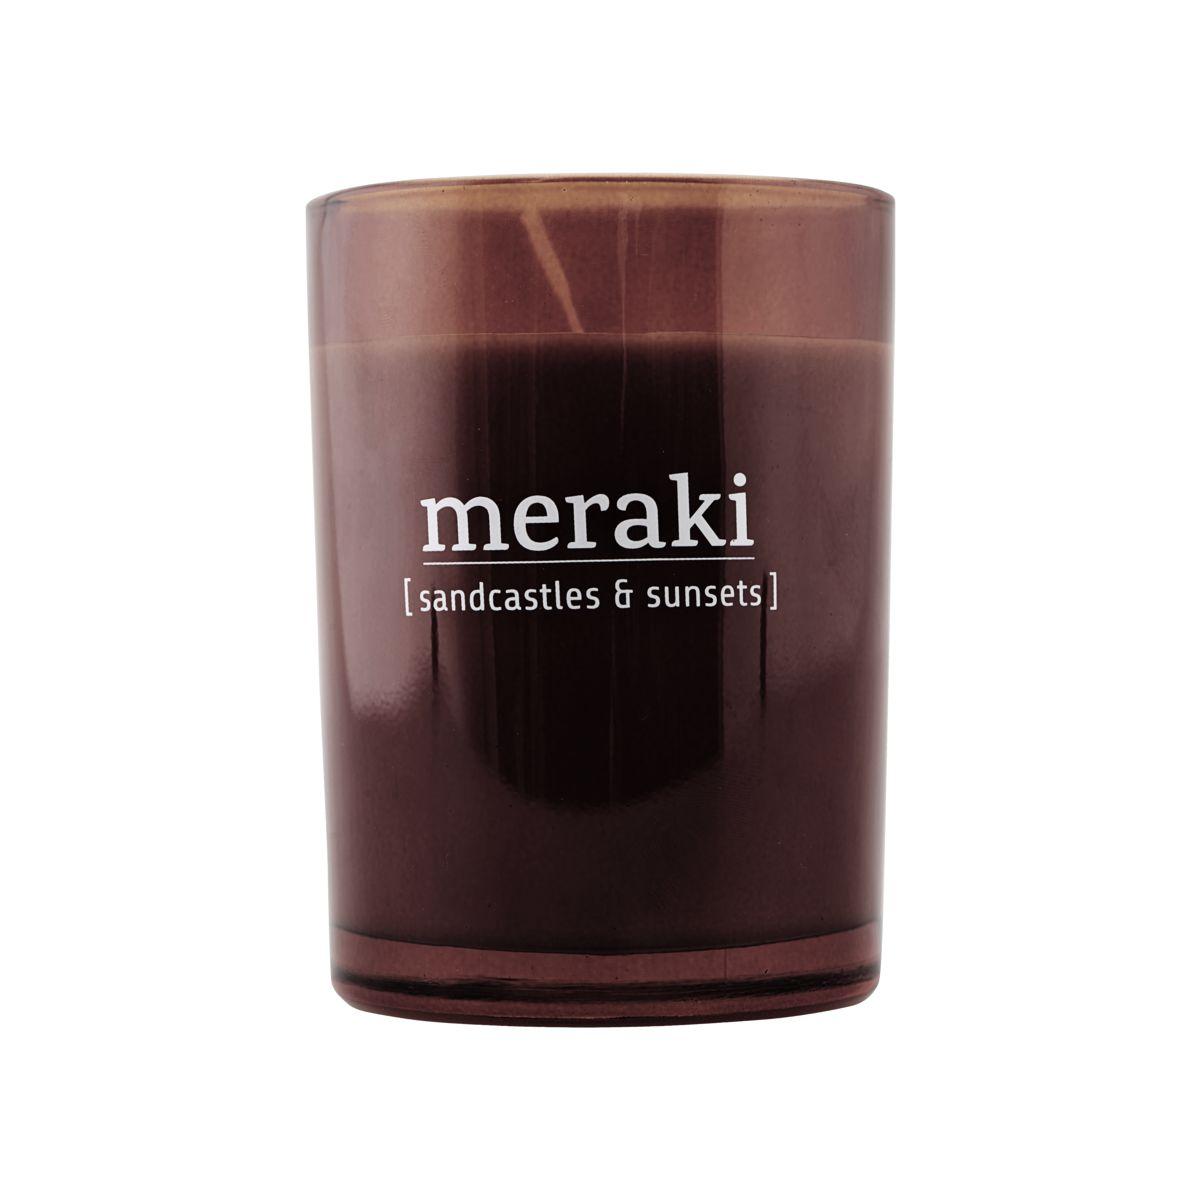 Image of   Meraki Duftlys Sandcastles & Sunsets dia.: 8 cm, h.: 10.5 cm